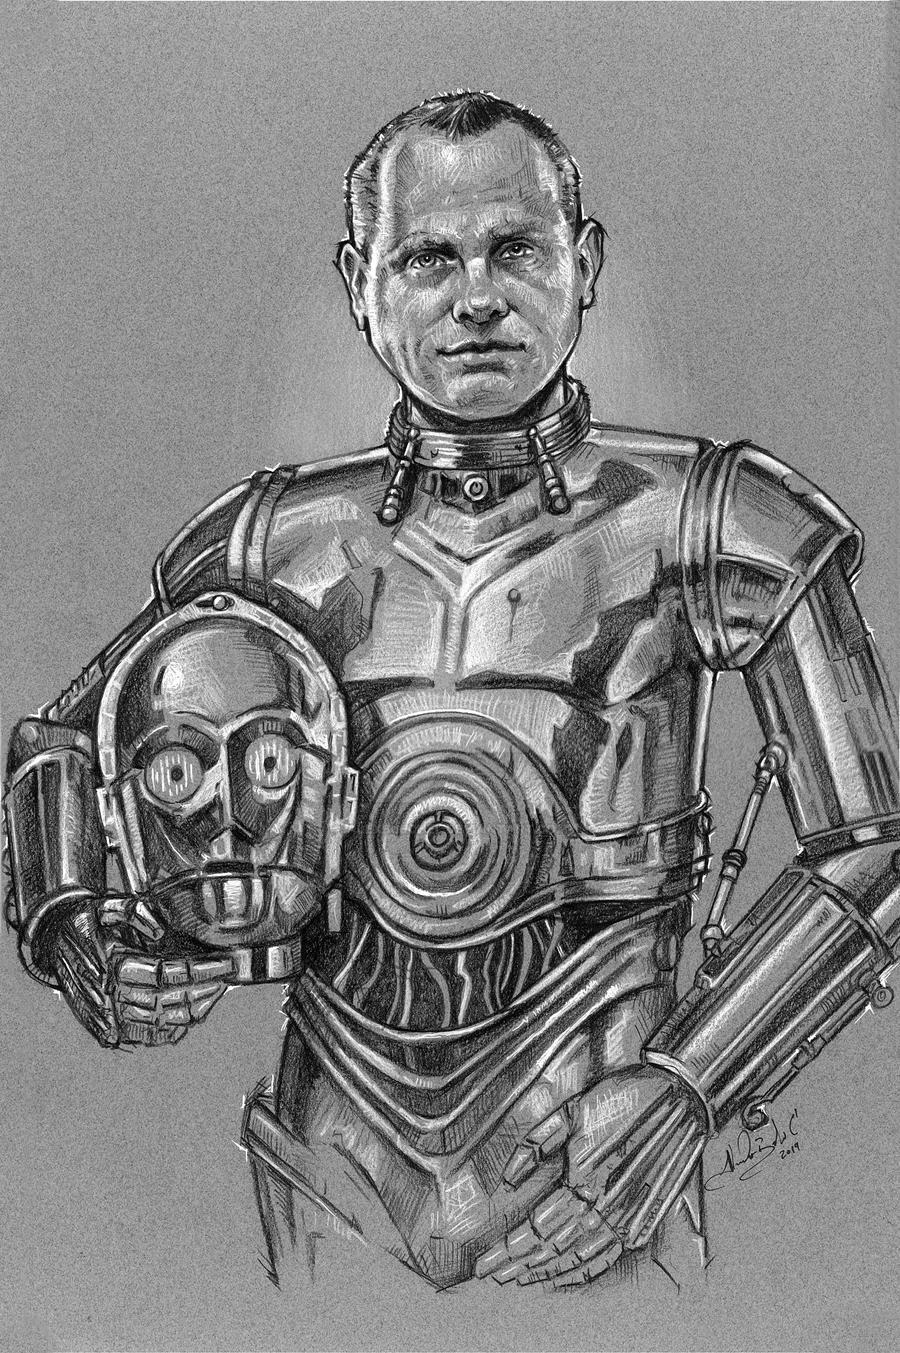 Mark - as C3PO